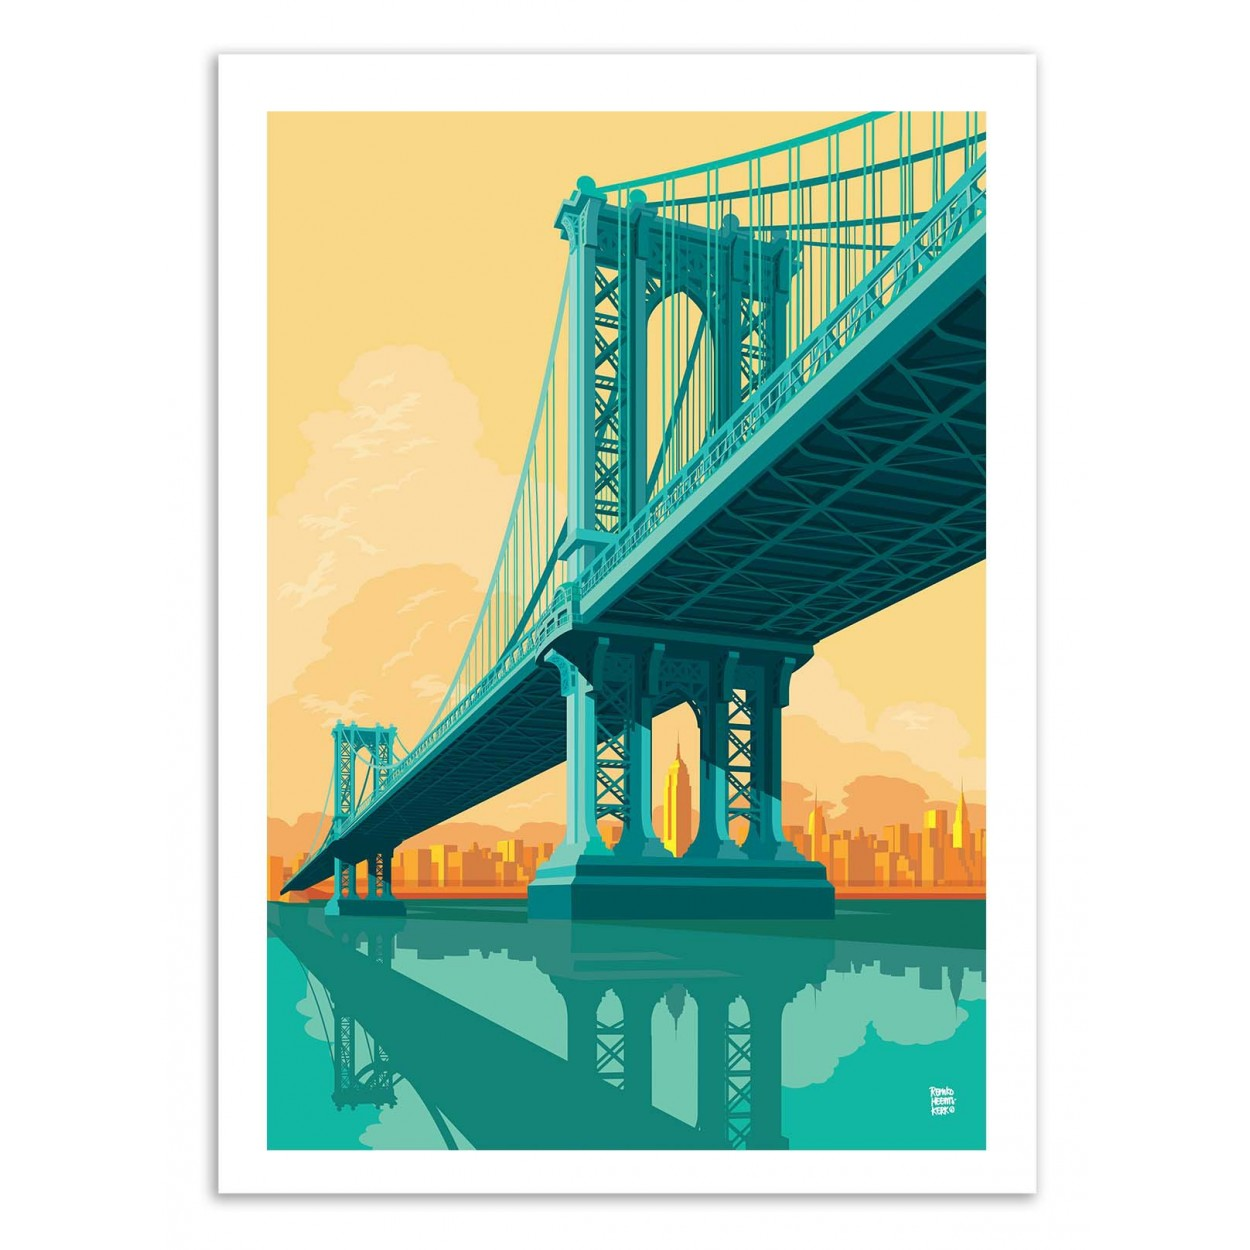 MANHATTAN BRIDGE -  Affiche d'art 50 x 70 cm